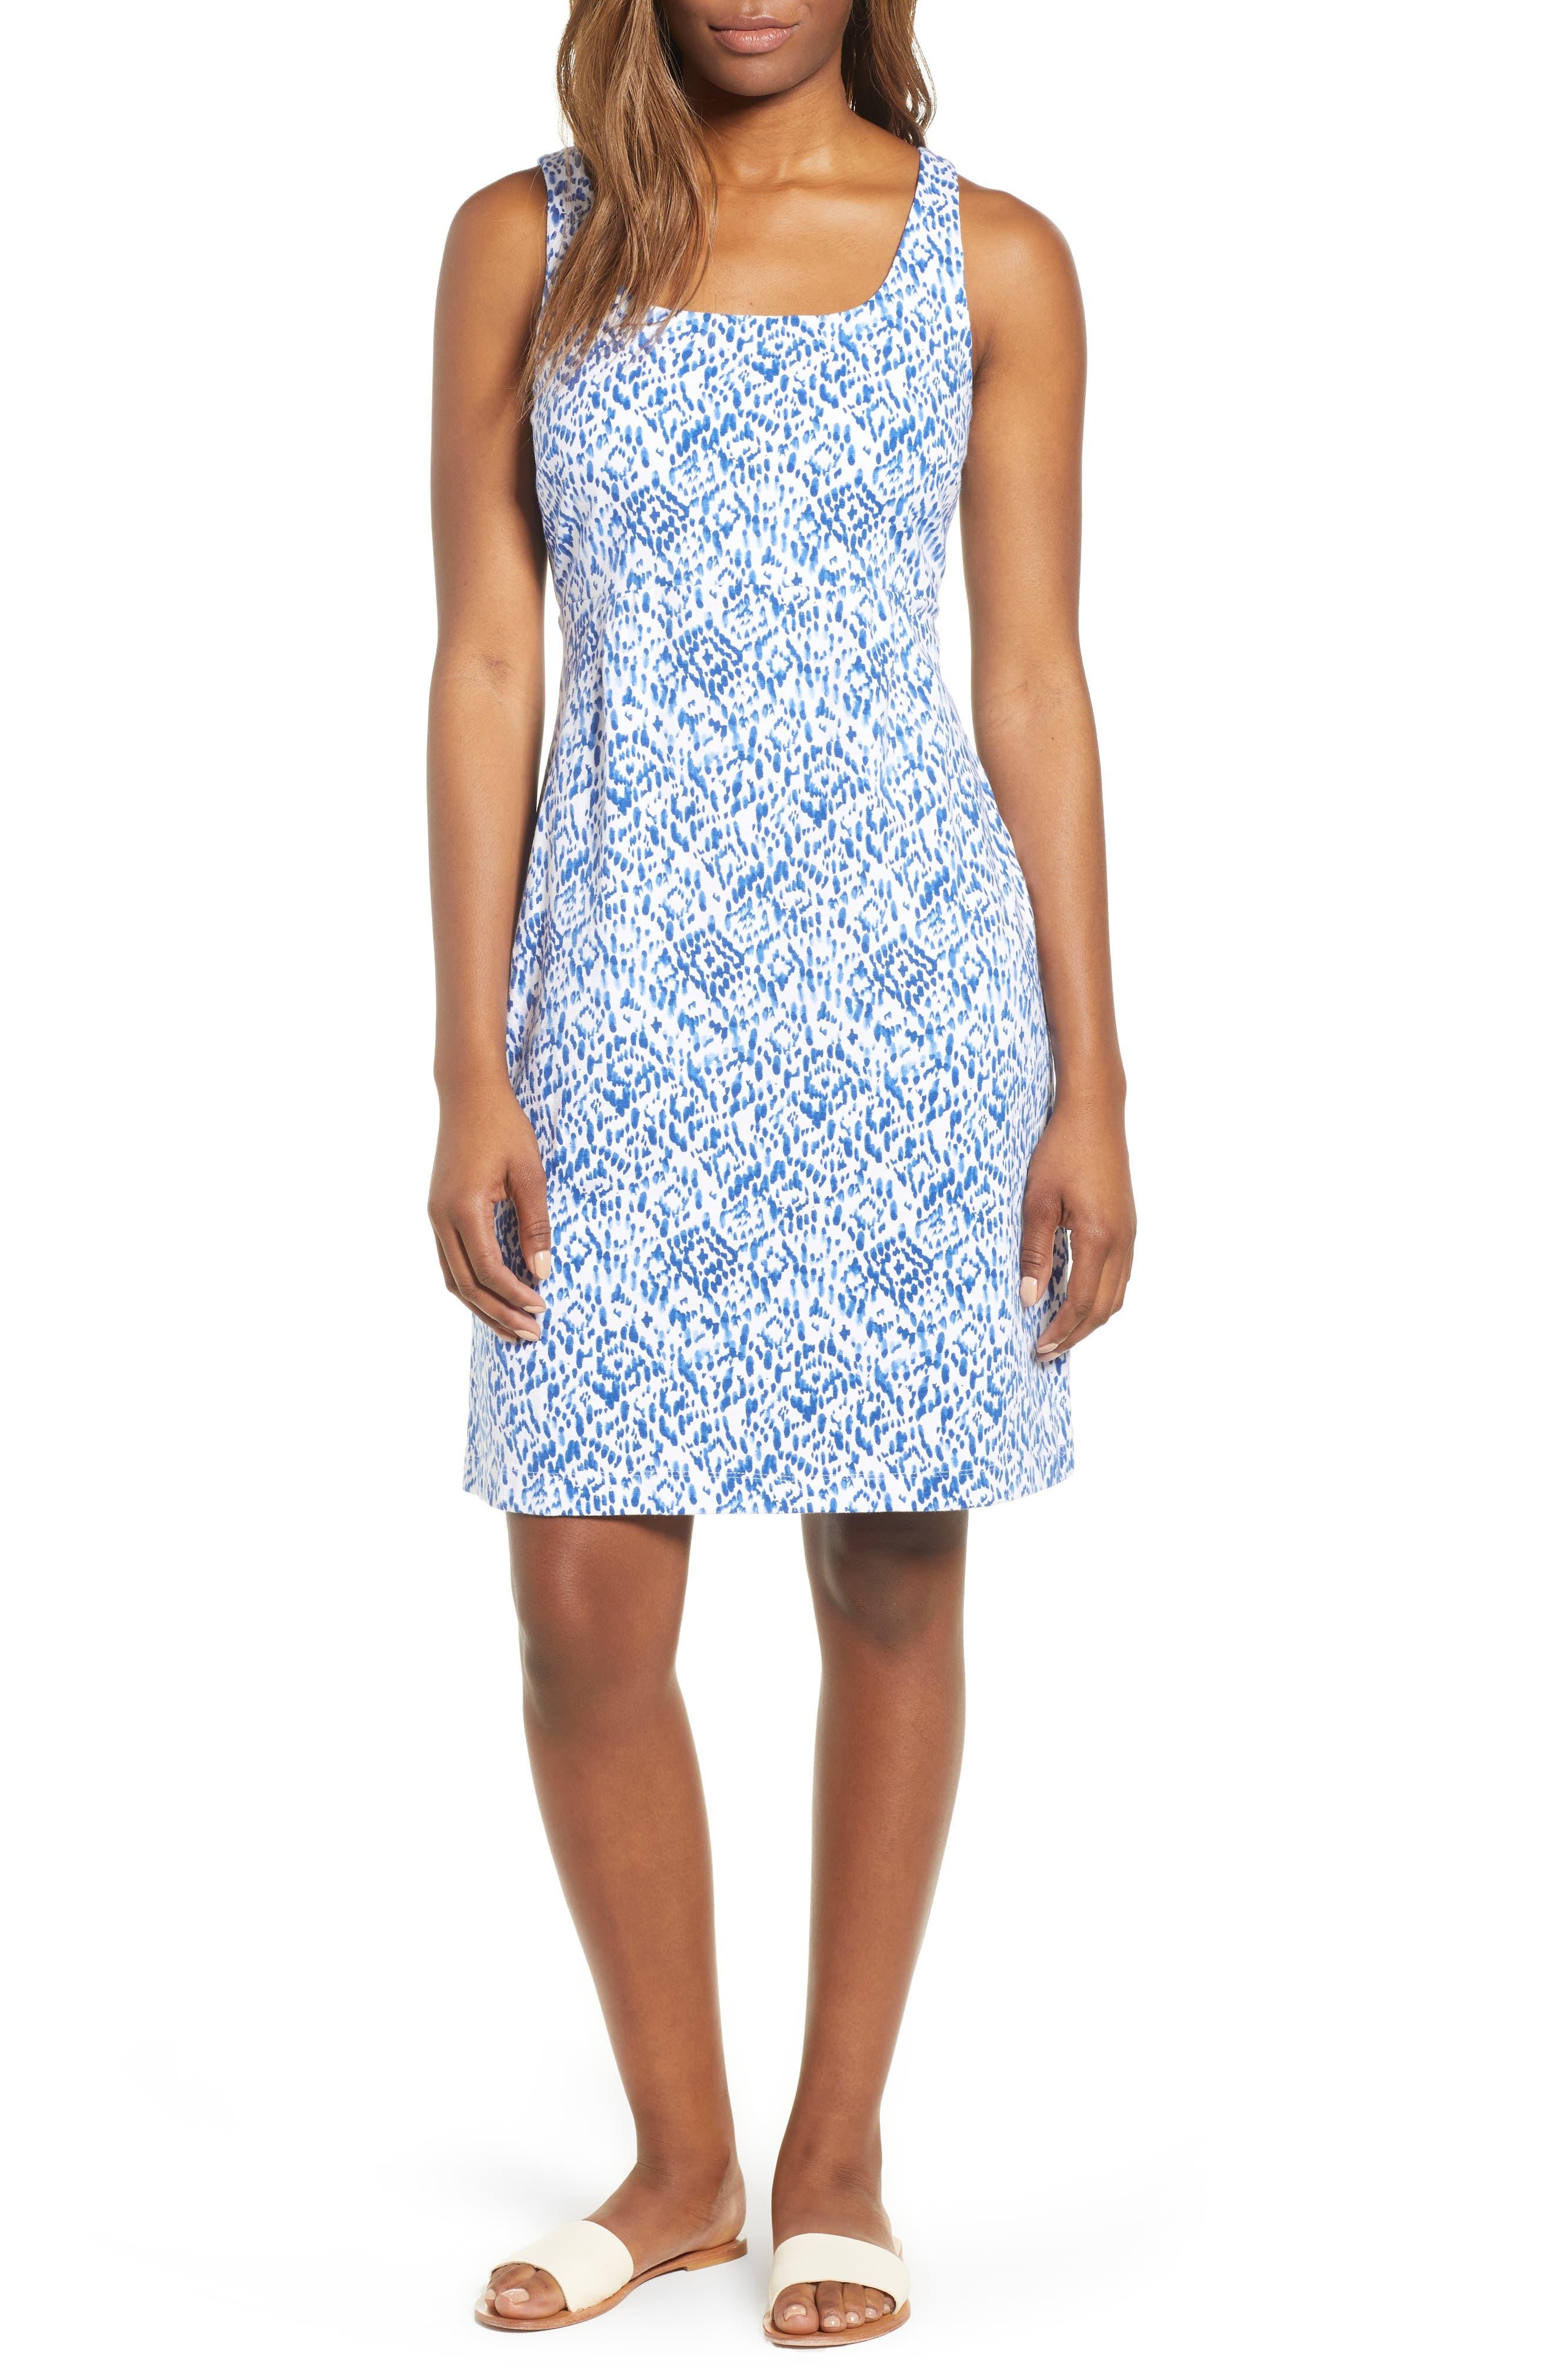 La Liorena Sleeveless Stretch Cotton Tank Dress,                         Main,                         color, Palace Blue